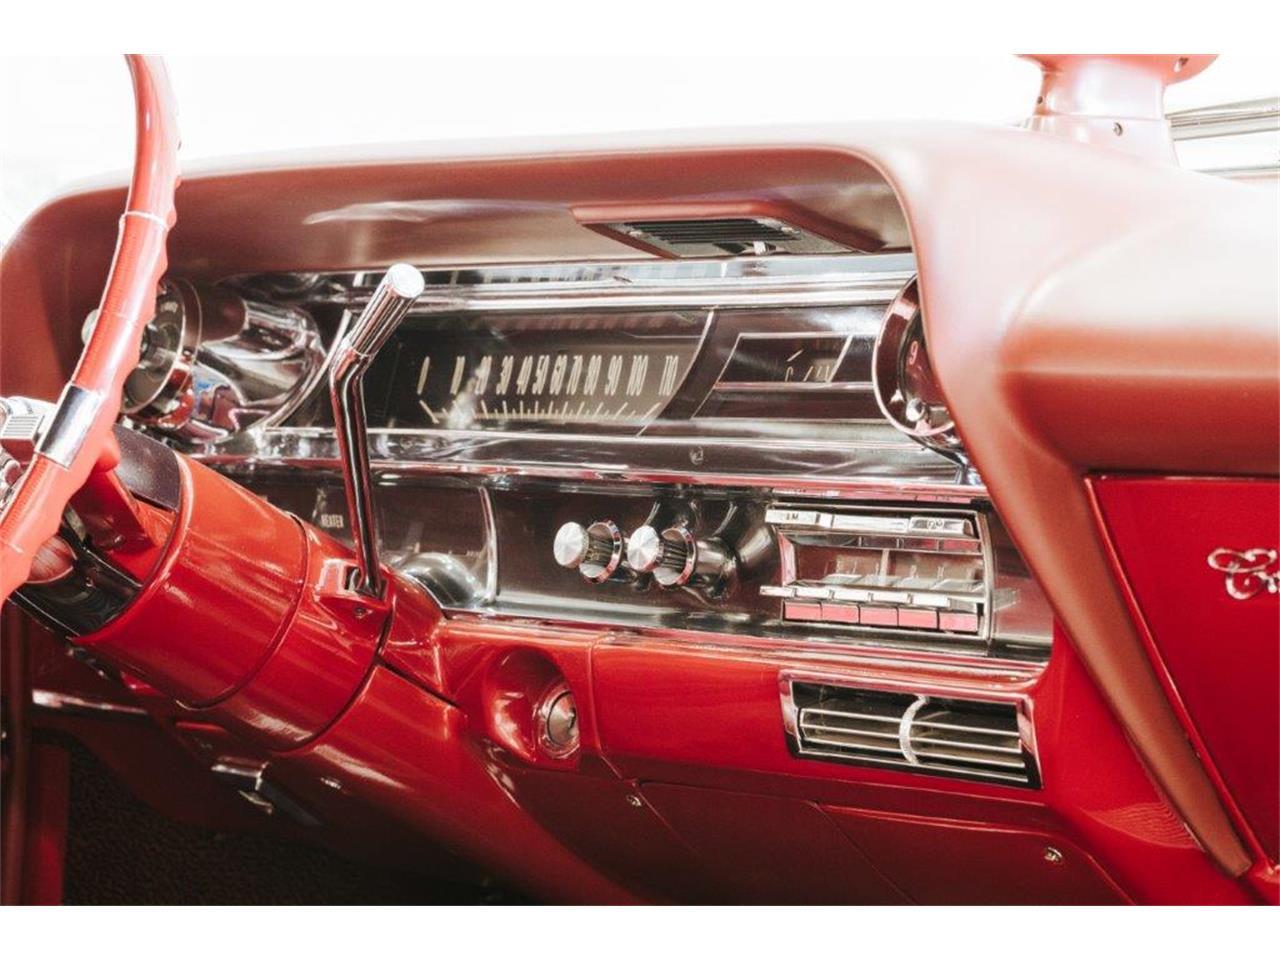 1963 Cadillac Series 62 (CC-1422177) for sale in Medicine Hat, Alberta